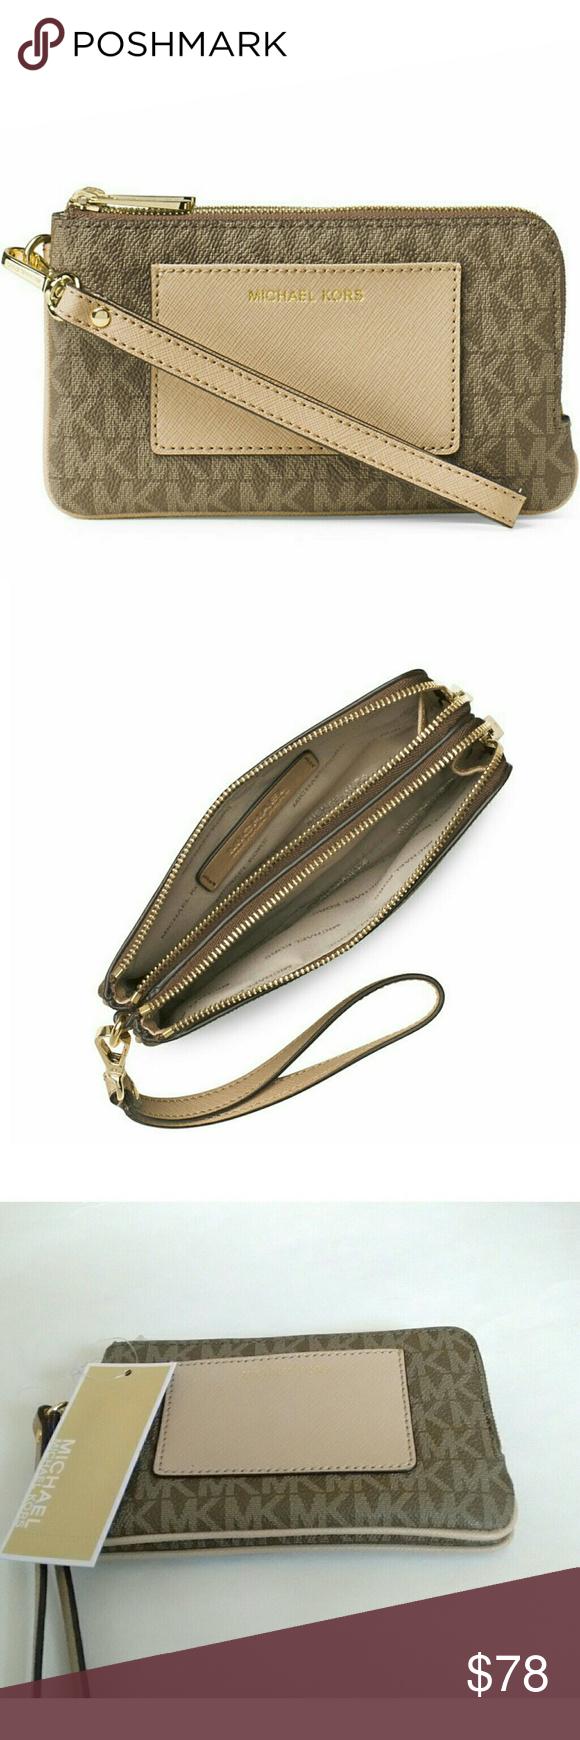 bc9c101a14c1 MICHAEL KORS Double Zipper Wristlet w Pocket MICHAEL Michael Kors Bedford  Medium Double Zip Wristlet with Pocket This stylish MICHAEL Michael Kors  Medium ...